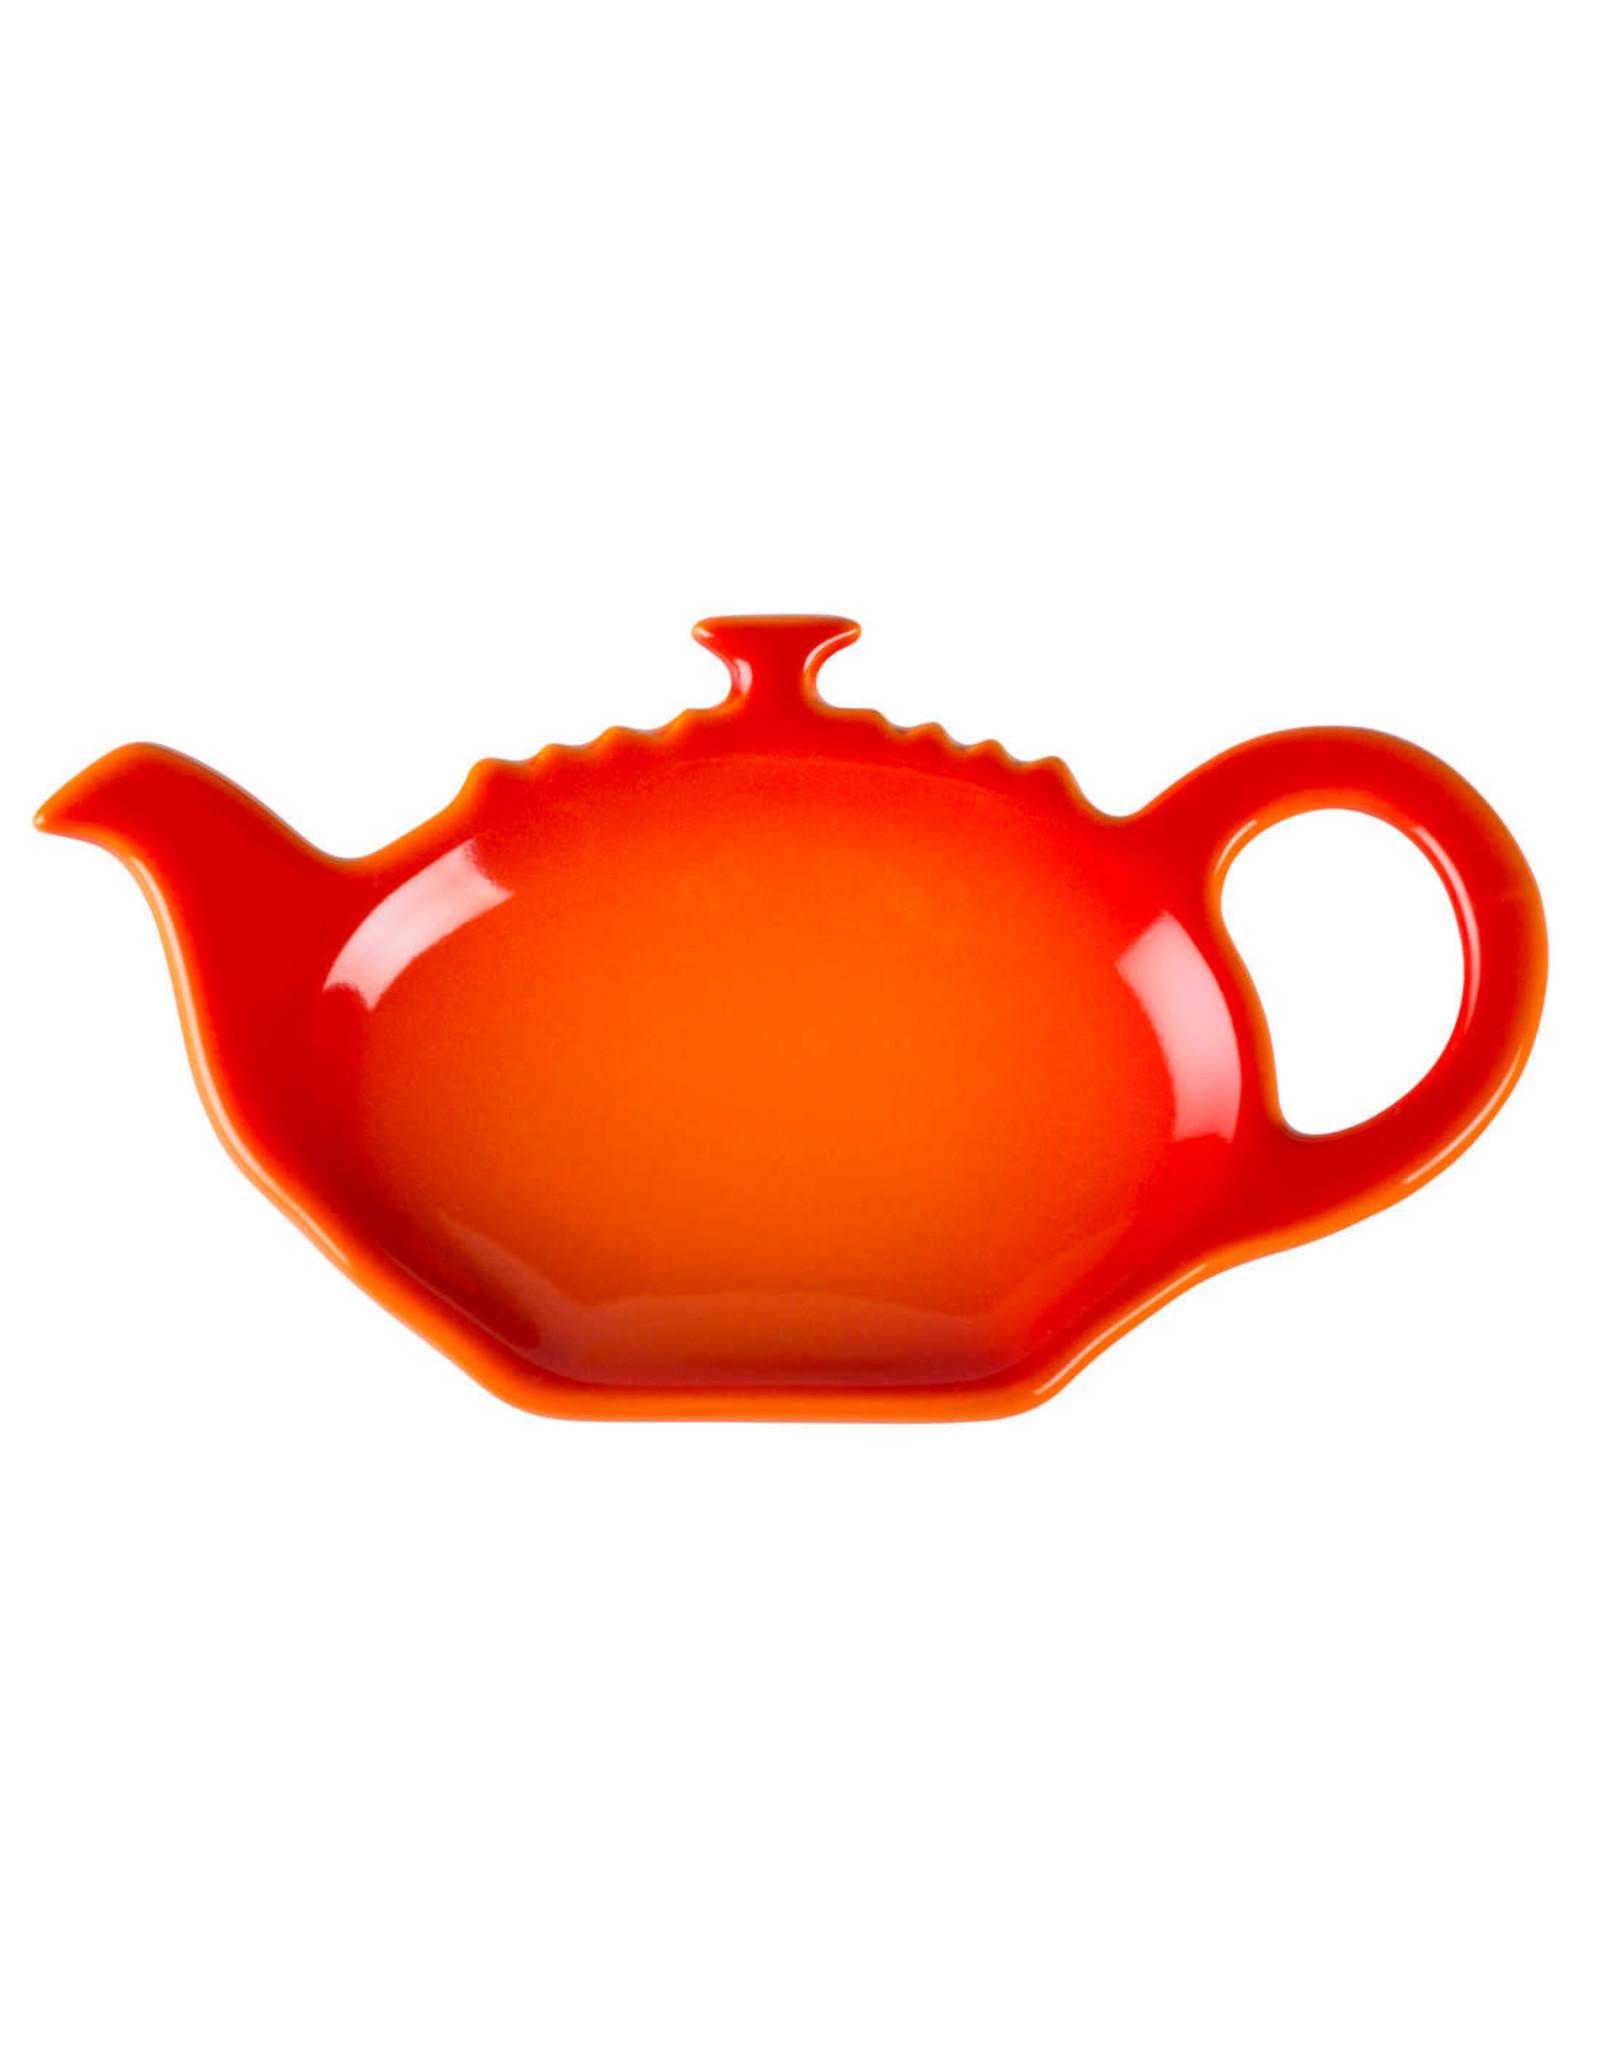 Le Creuset Le Creuset Tea Bag Holder Flame